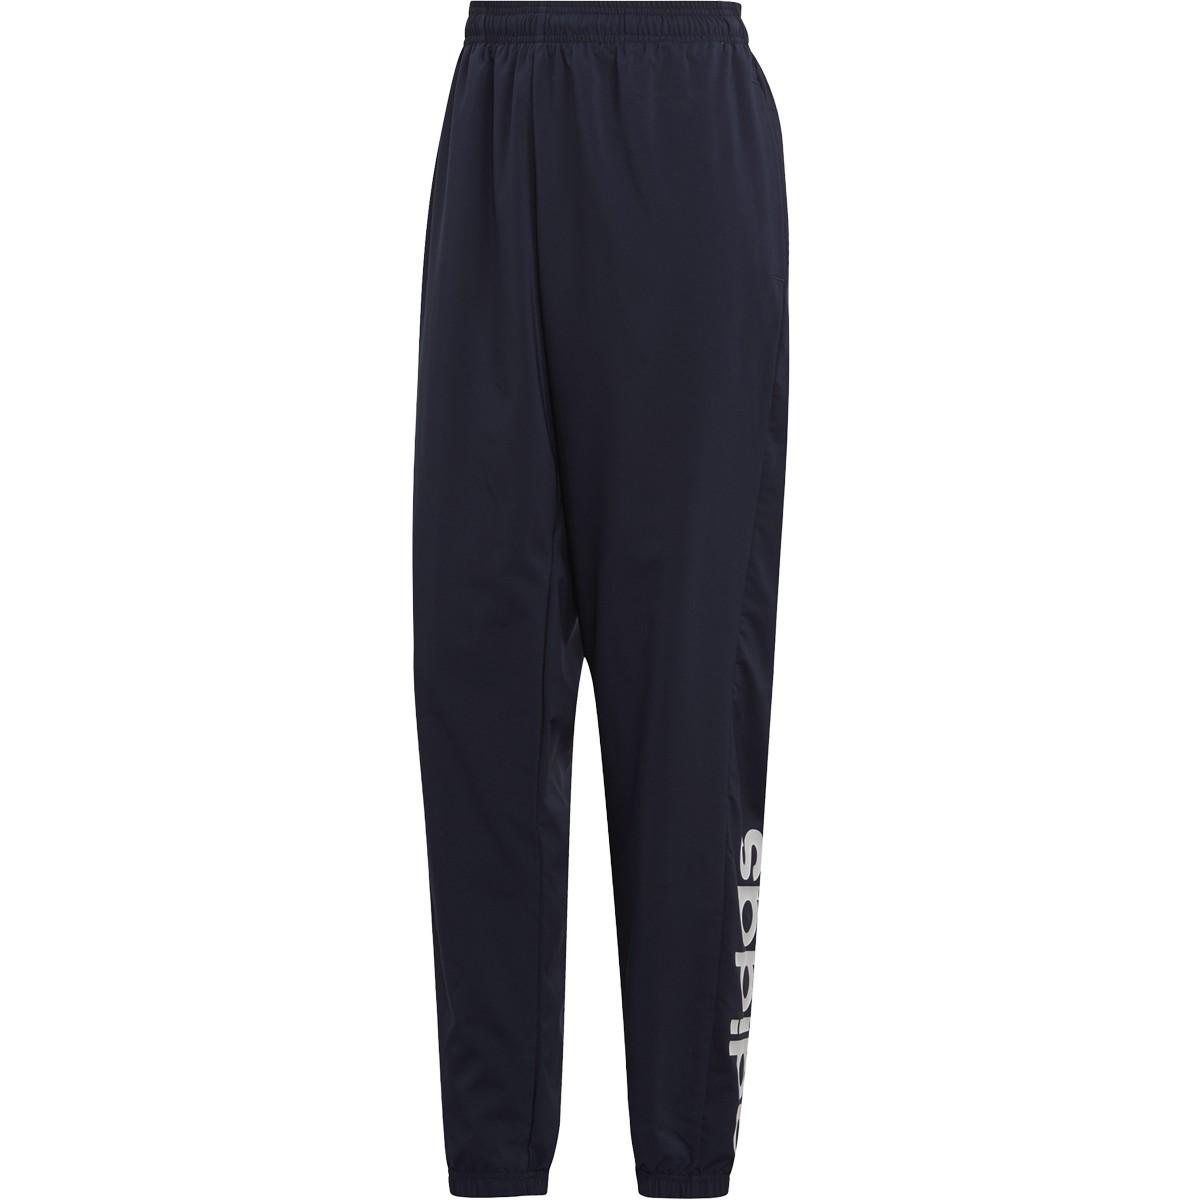 pantalon adidas essentials homme